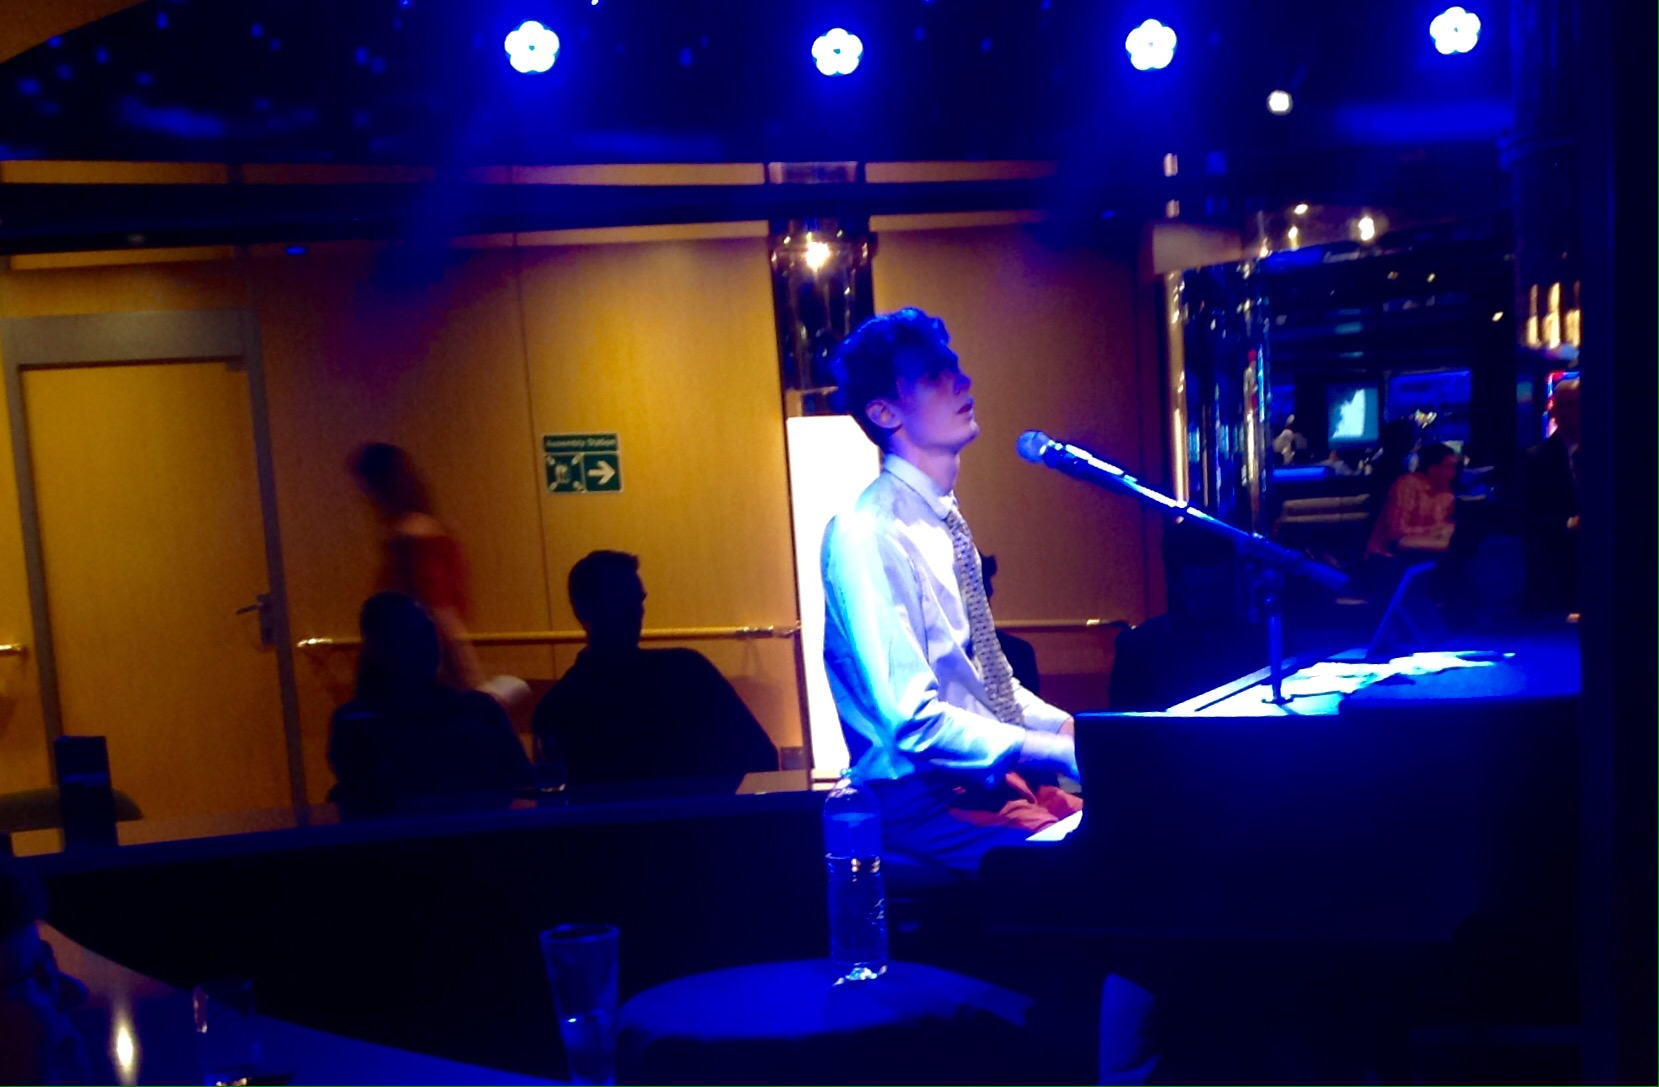 Billy Joel - Turnstiles